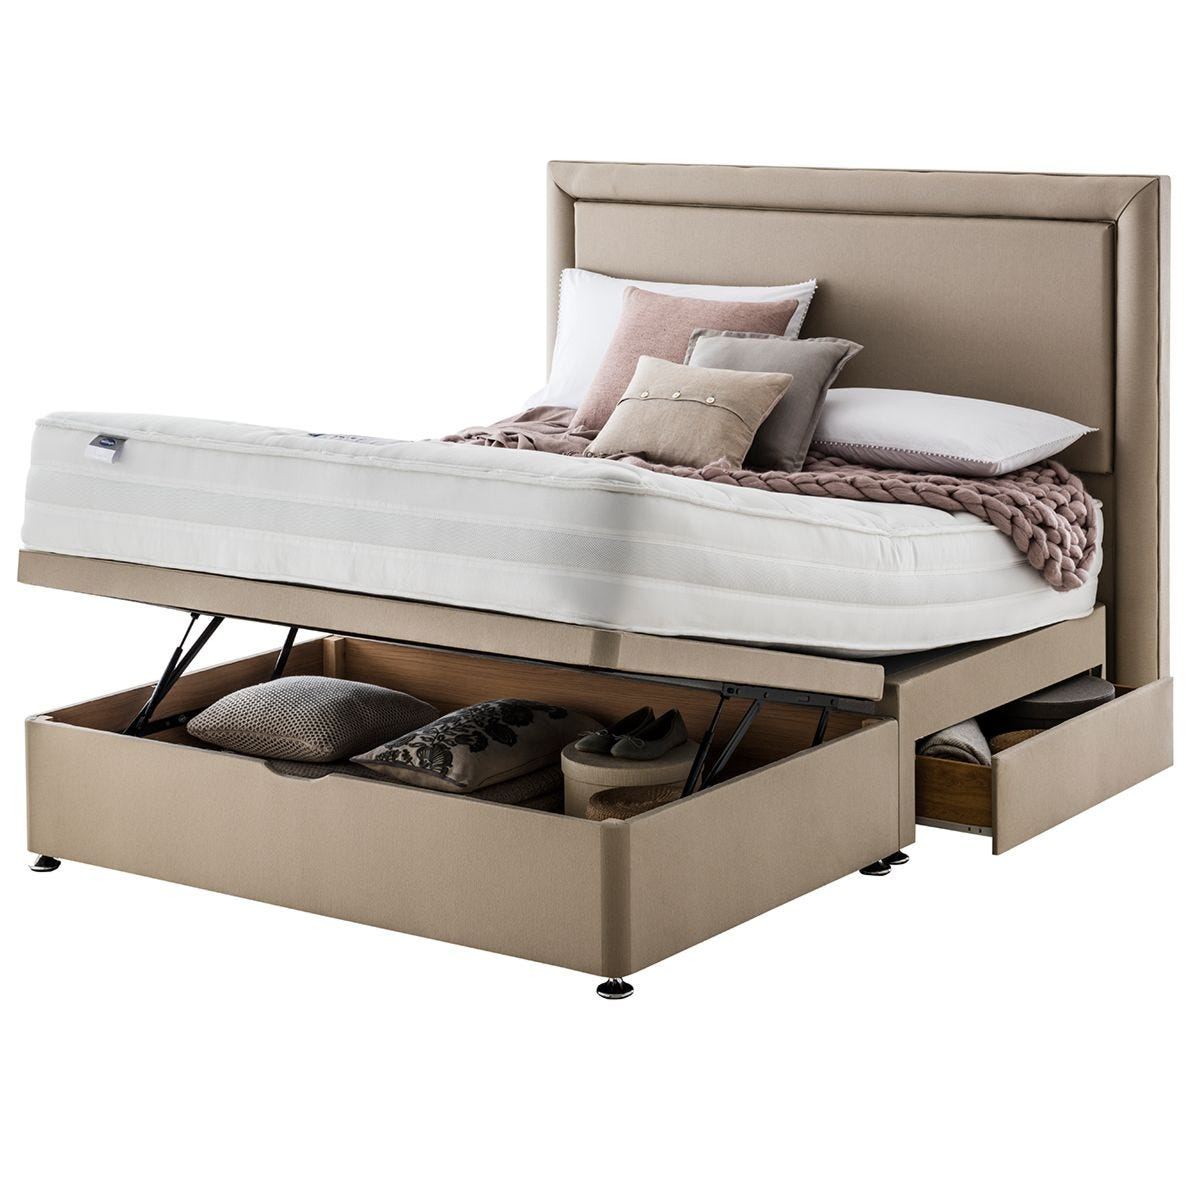 Silentnight Mirapocket 2000 135cm Memory Foam Mattress with Ottoman and 2 Drawer Divan Bed Set - Sand